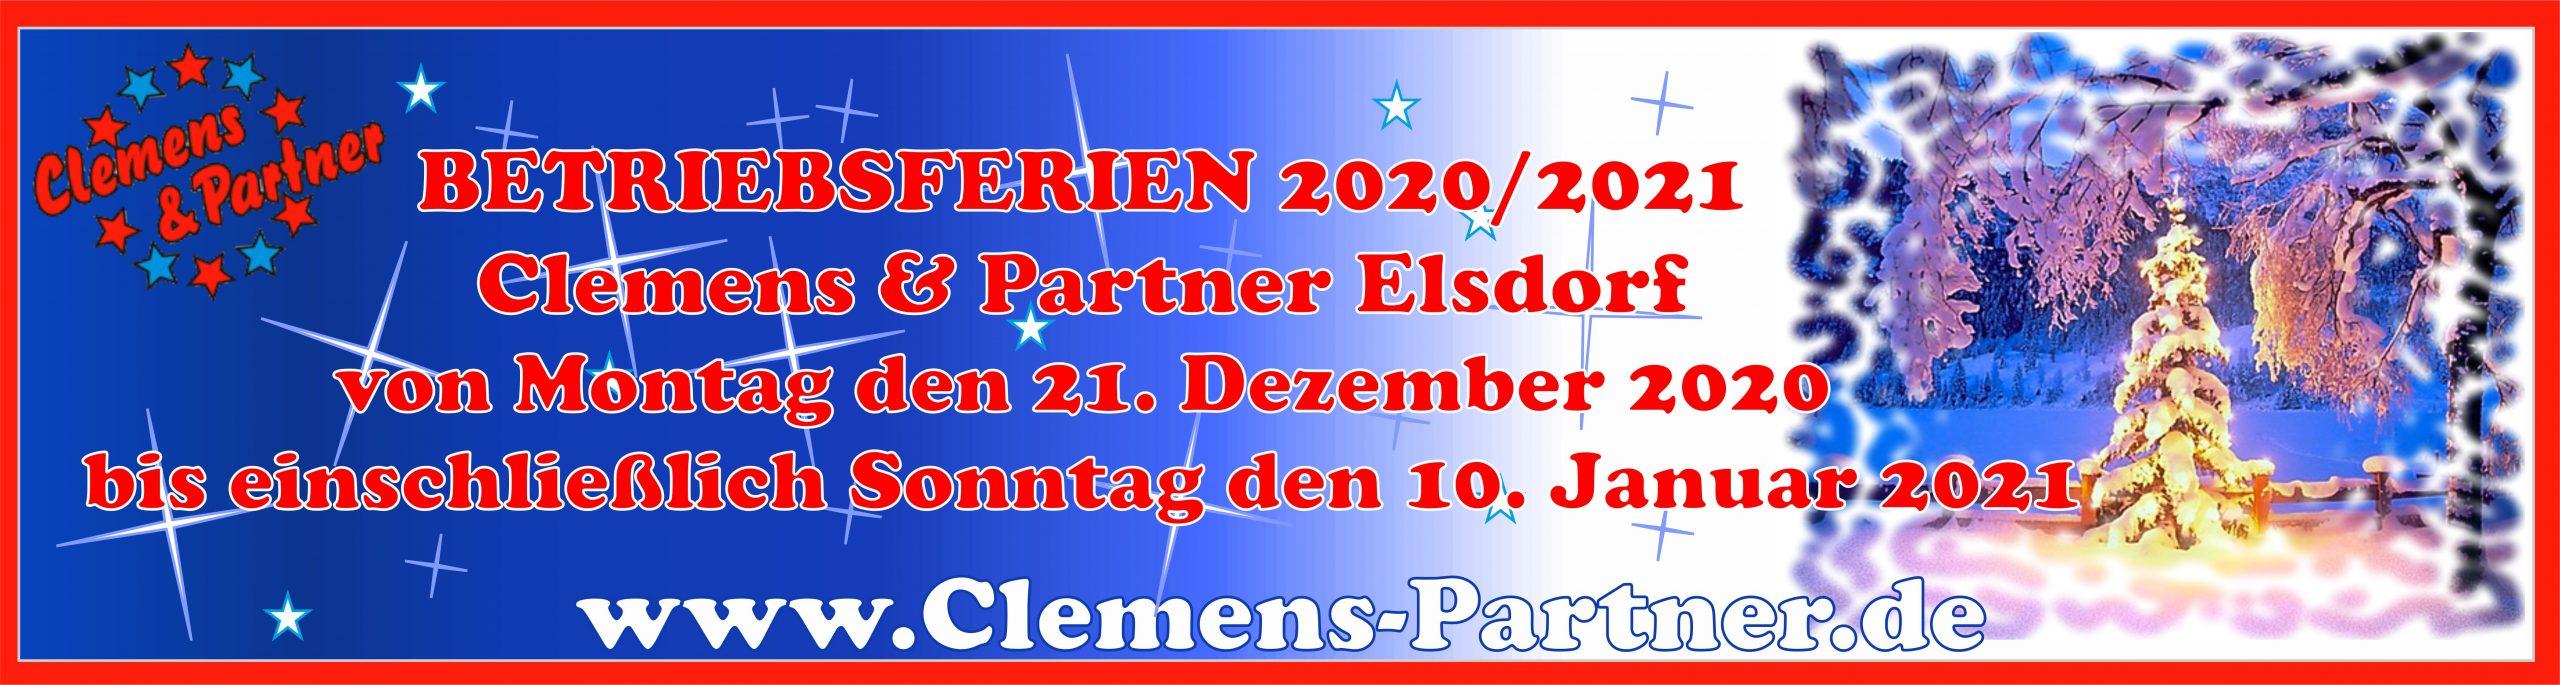 Betriebsferien Elsdorf 2020-2021